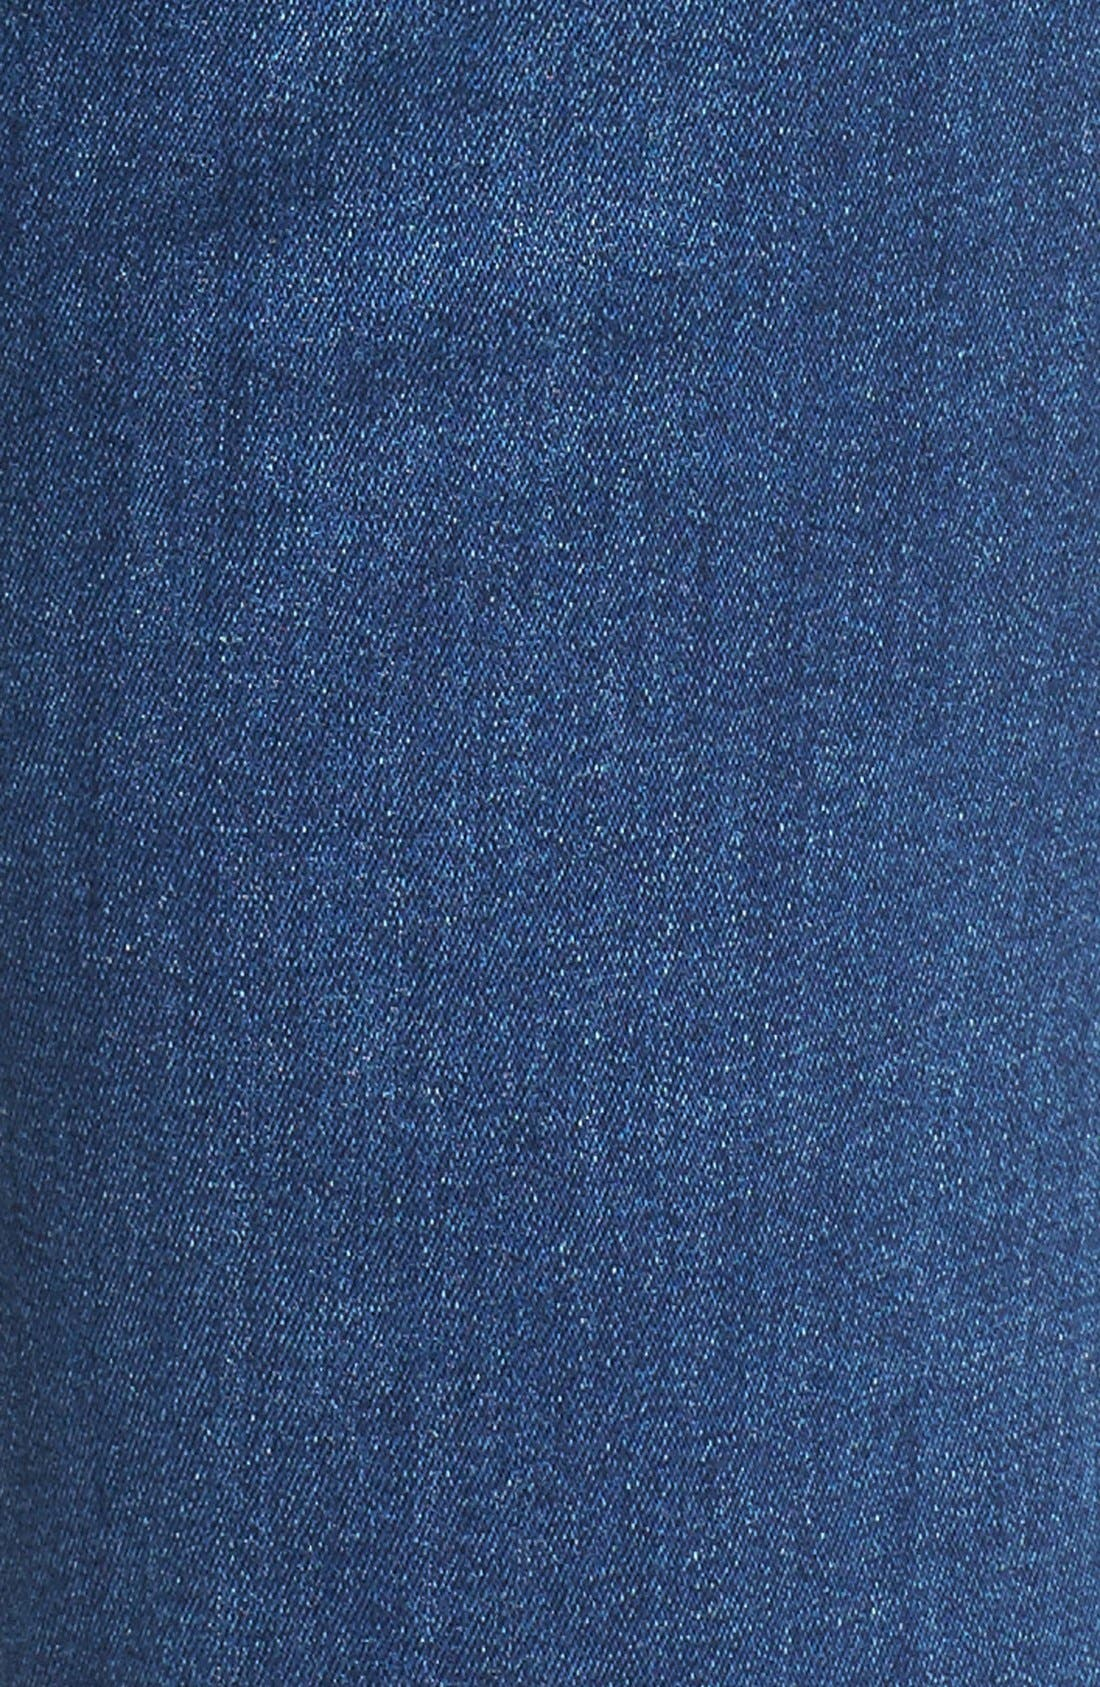 Alternate Image 5  - 7 For All Mankind® 'b(air) - Kimmie' Straight Leg Jeans (Duchess)